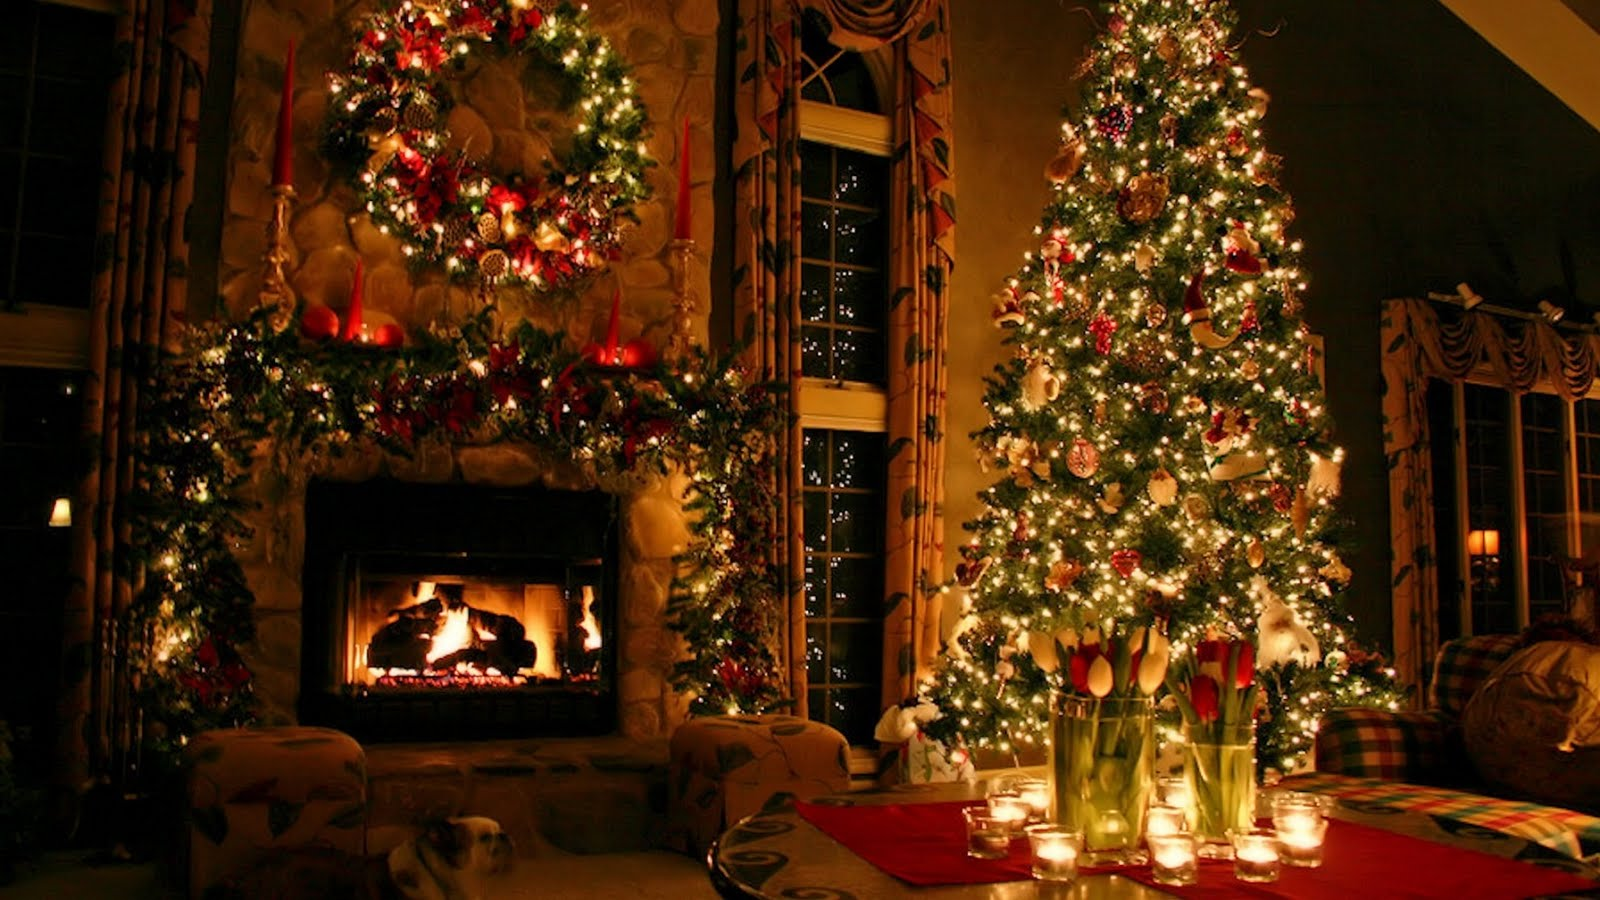 http://1.bp.blogspot.com/-SOHH0QBsYv8/Ts-sdpFx2-I/AAAAAAAACkM/lLdbCSCOgA0/s1600/Christmas%2BWallpaper.jpg